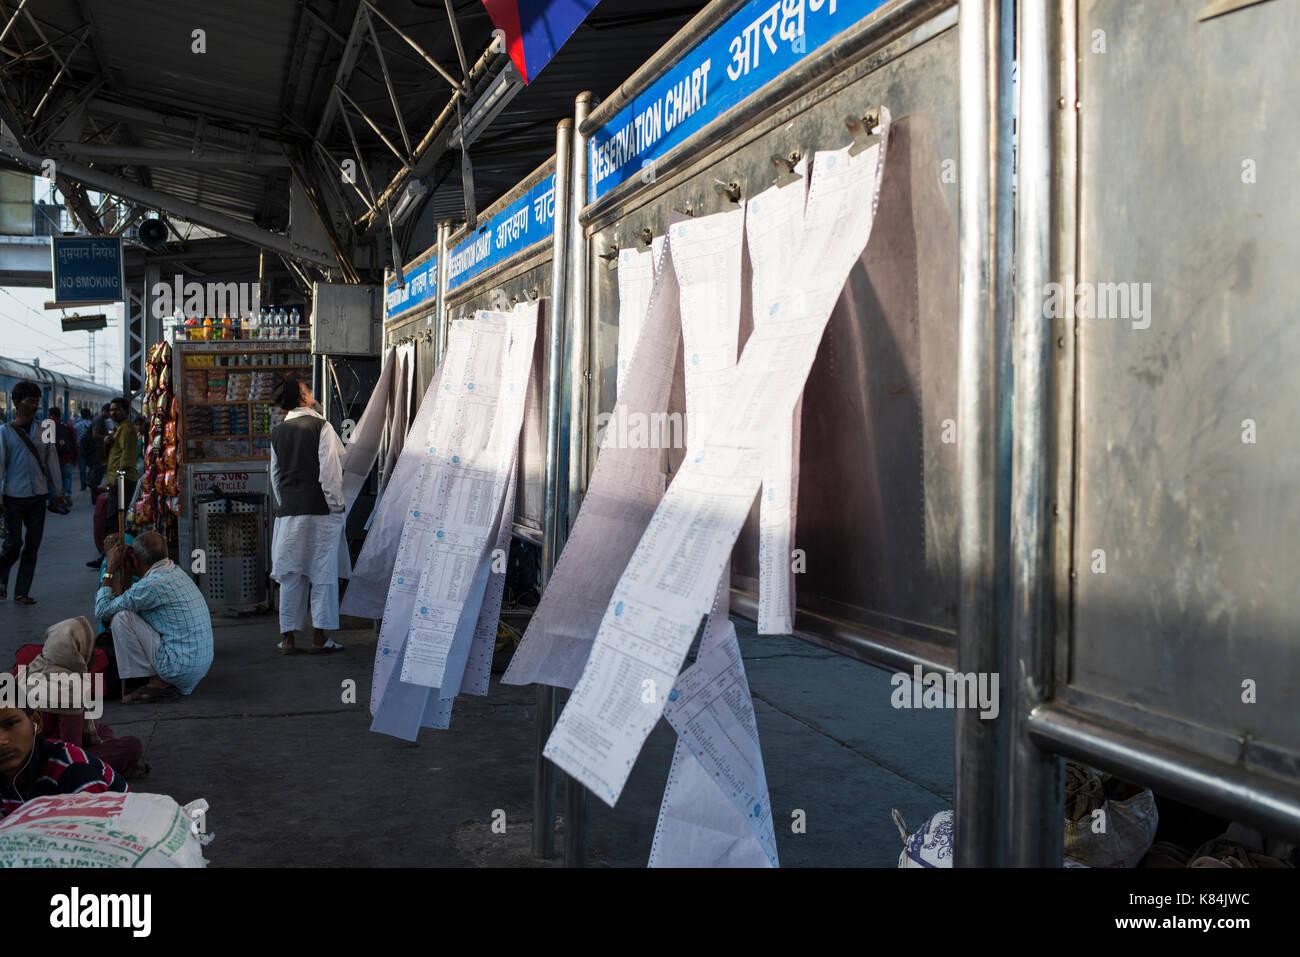 Passenger lists, Delhi - Stock Image